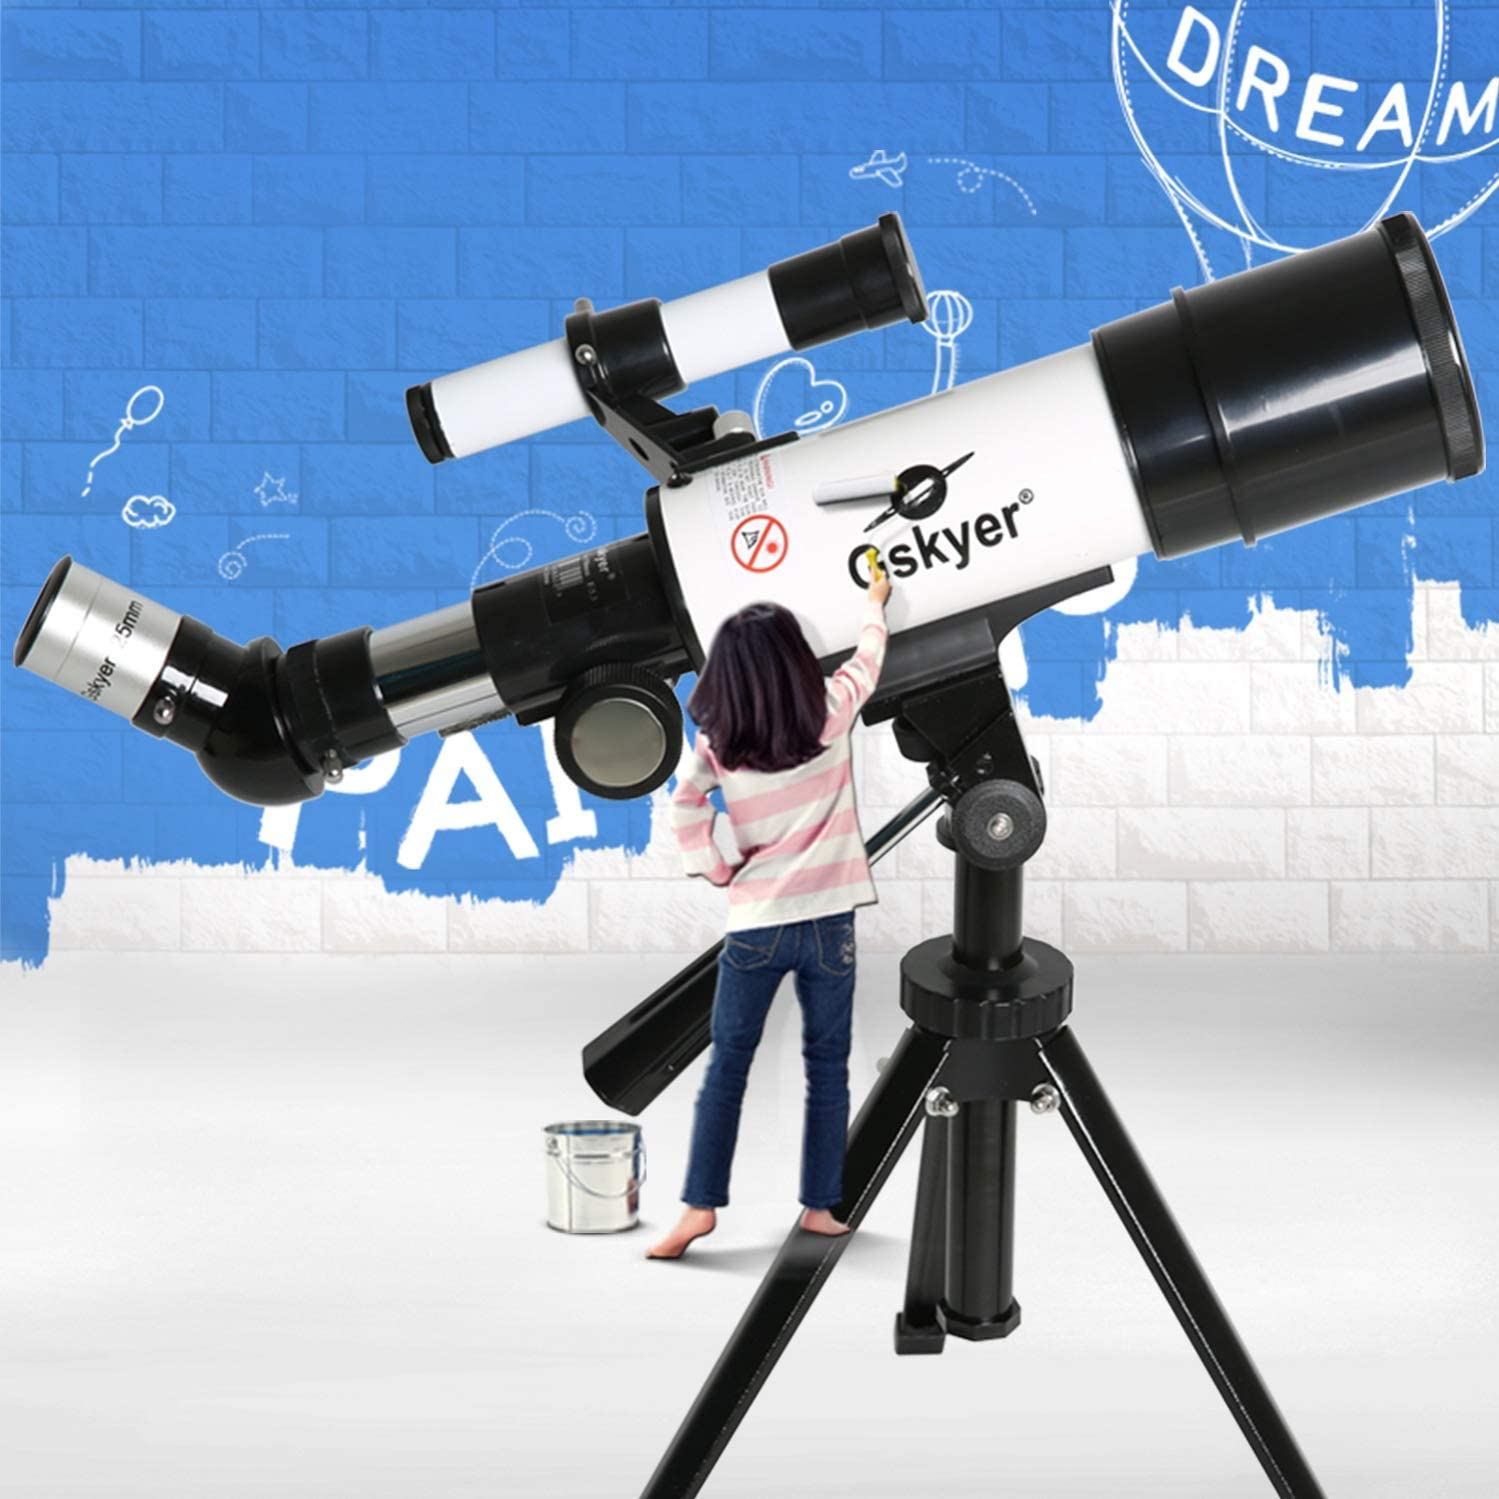 60mm AZ Refractor Telescope Gskyer Telescope German Technology Travel Scope